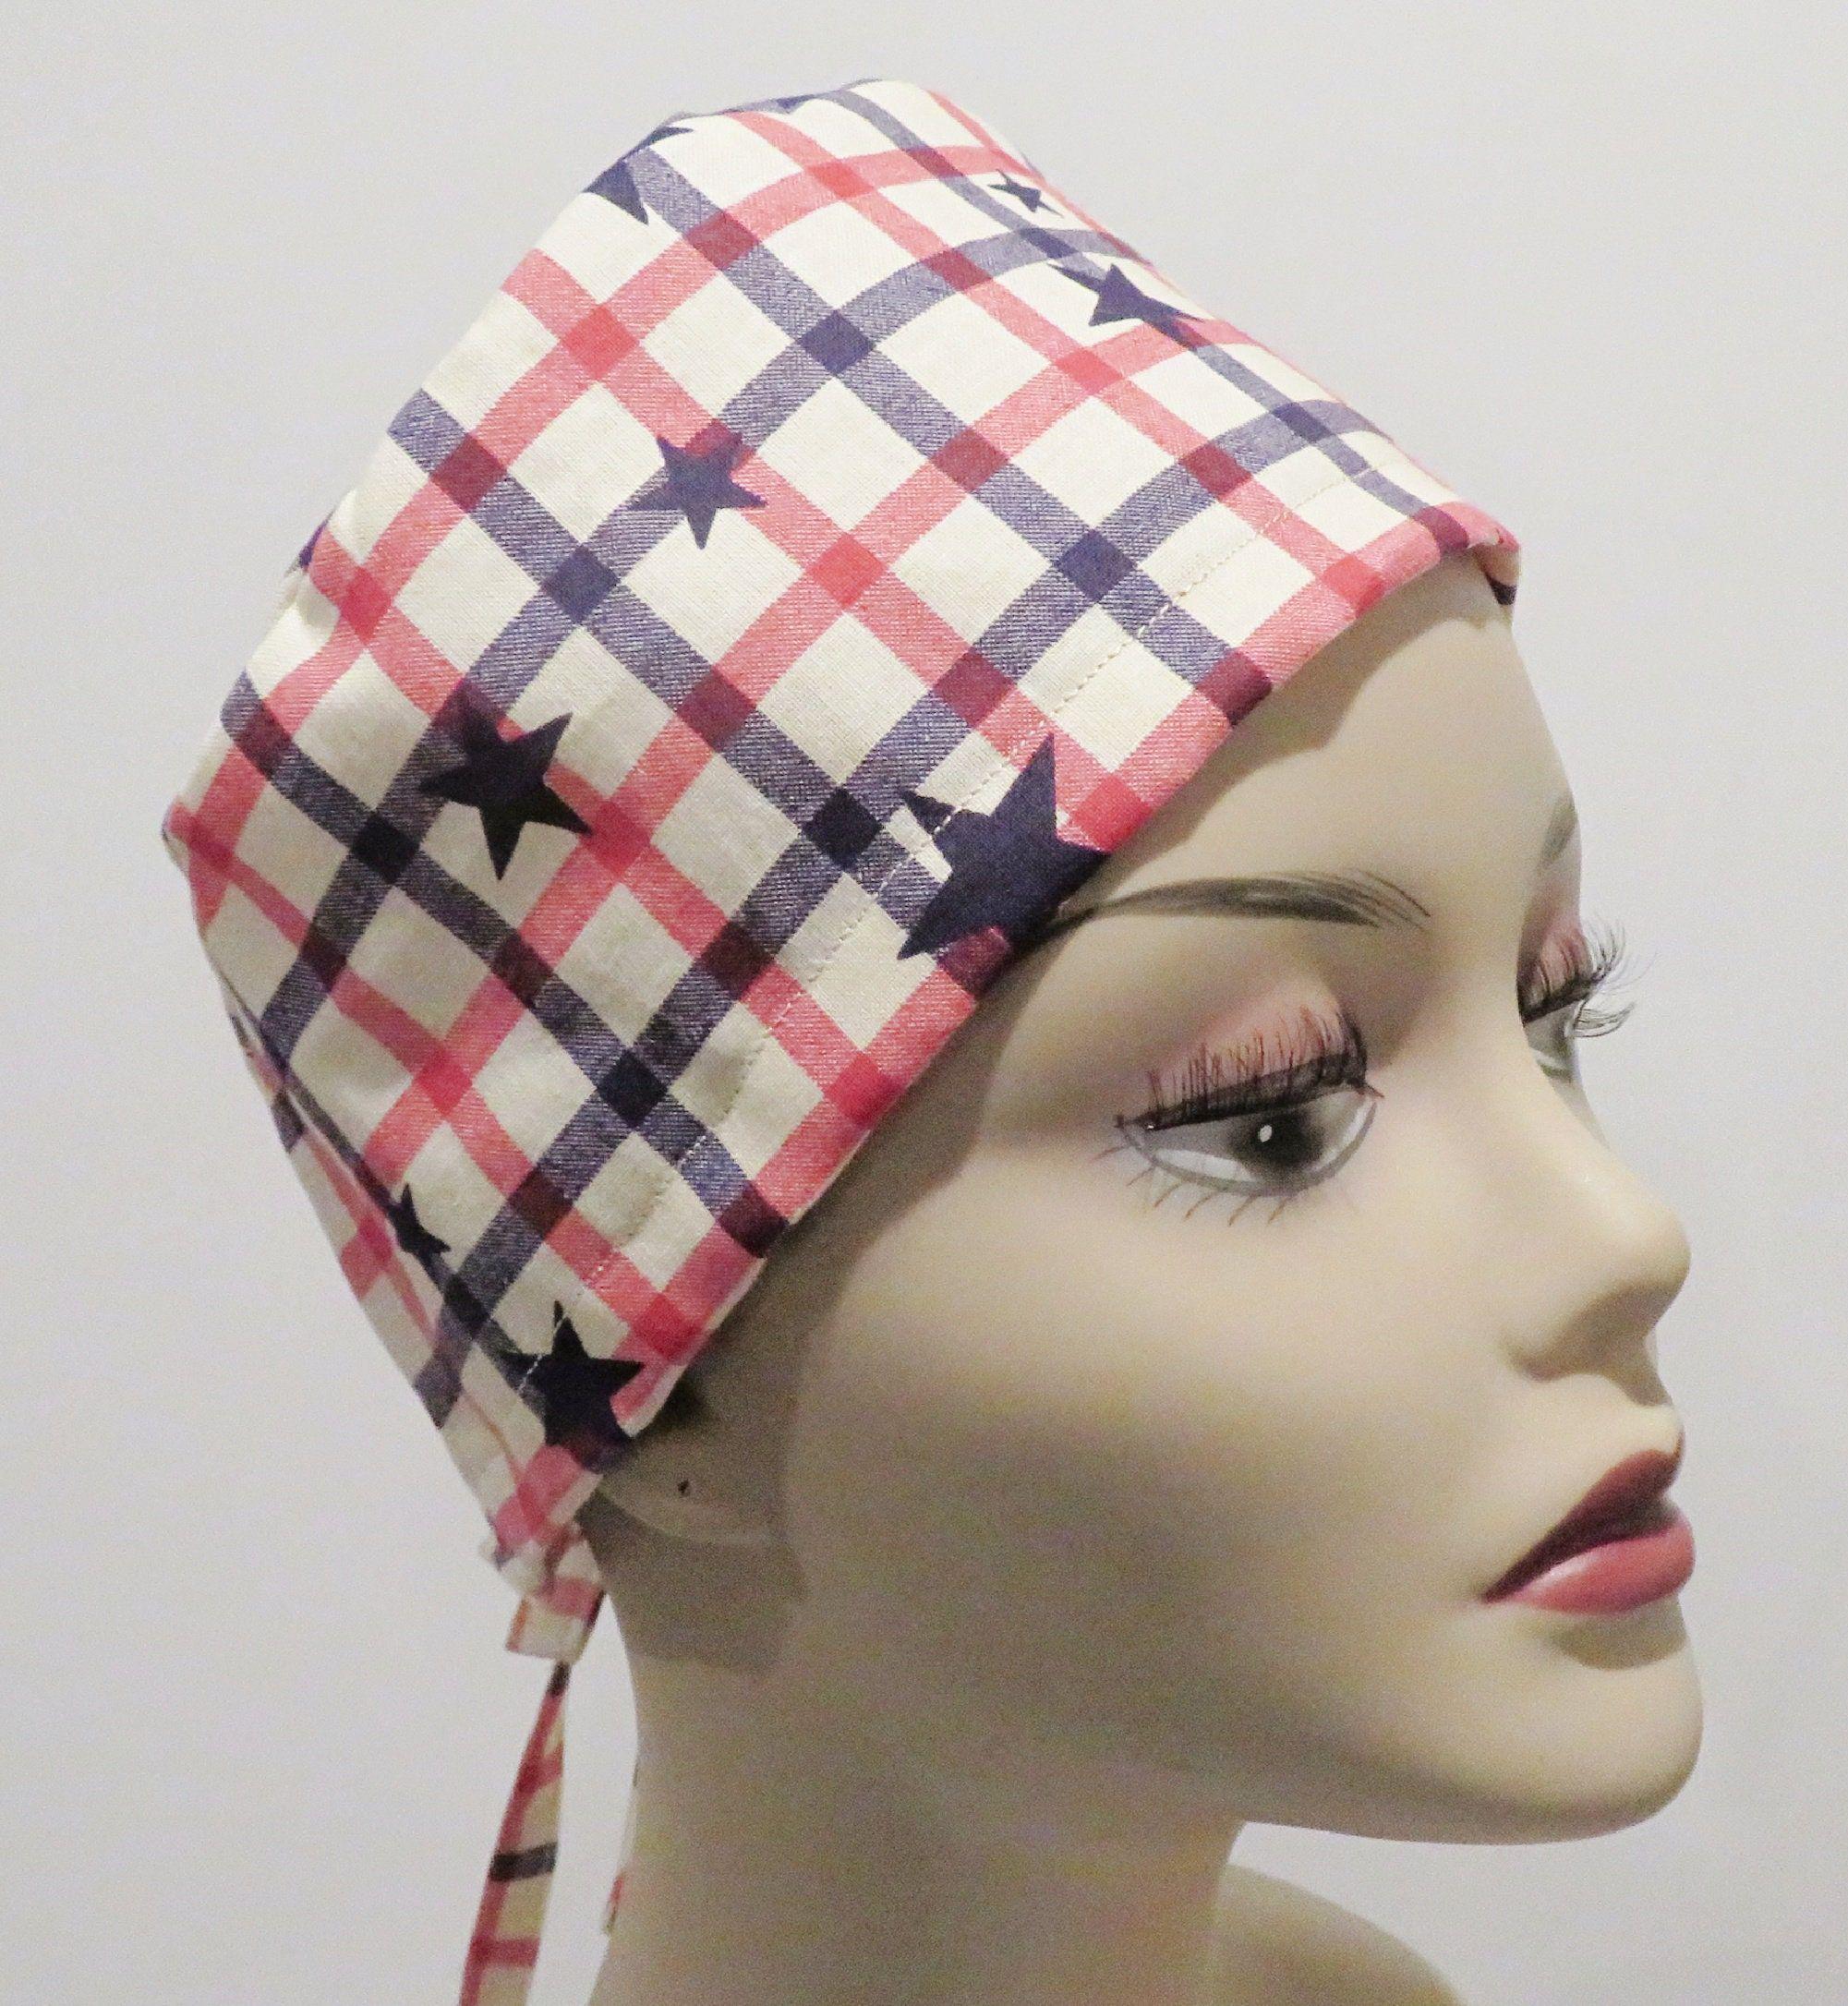 STARS fabric scrub hats, Tie back scrub hats, men scrub hats, Patriotic scrub hats, Stars scrub hats, Unisex scrub hats, Plaid scrub hat